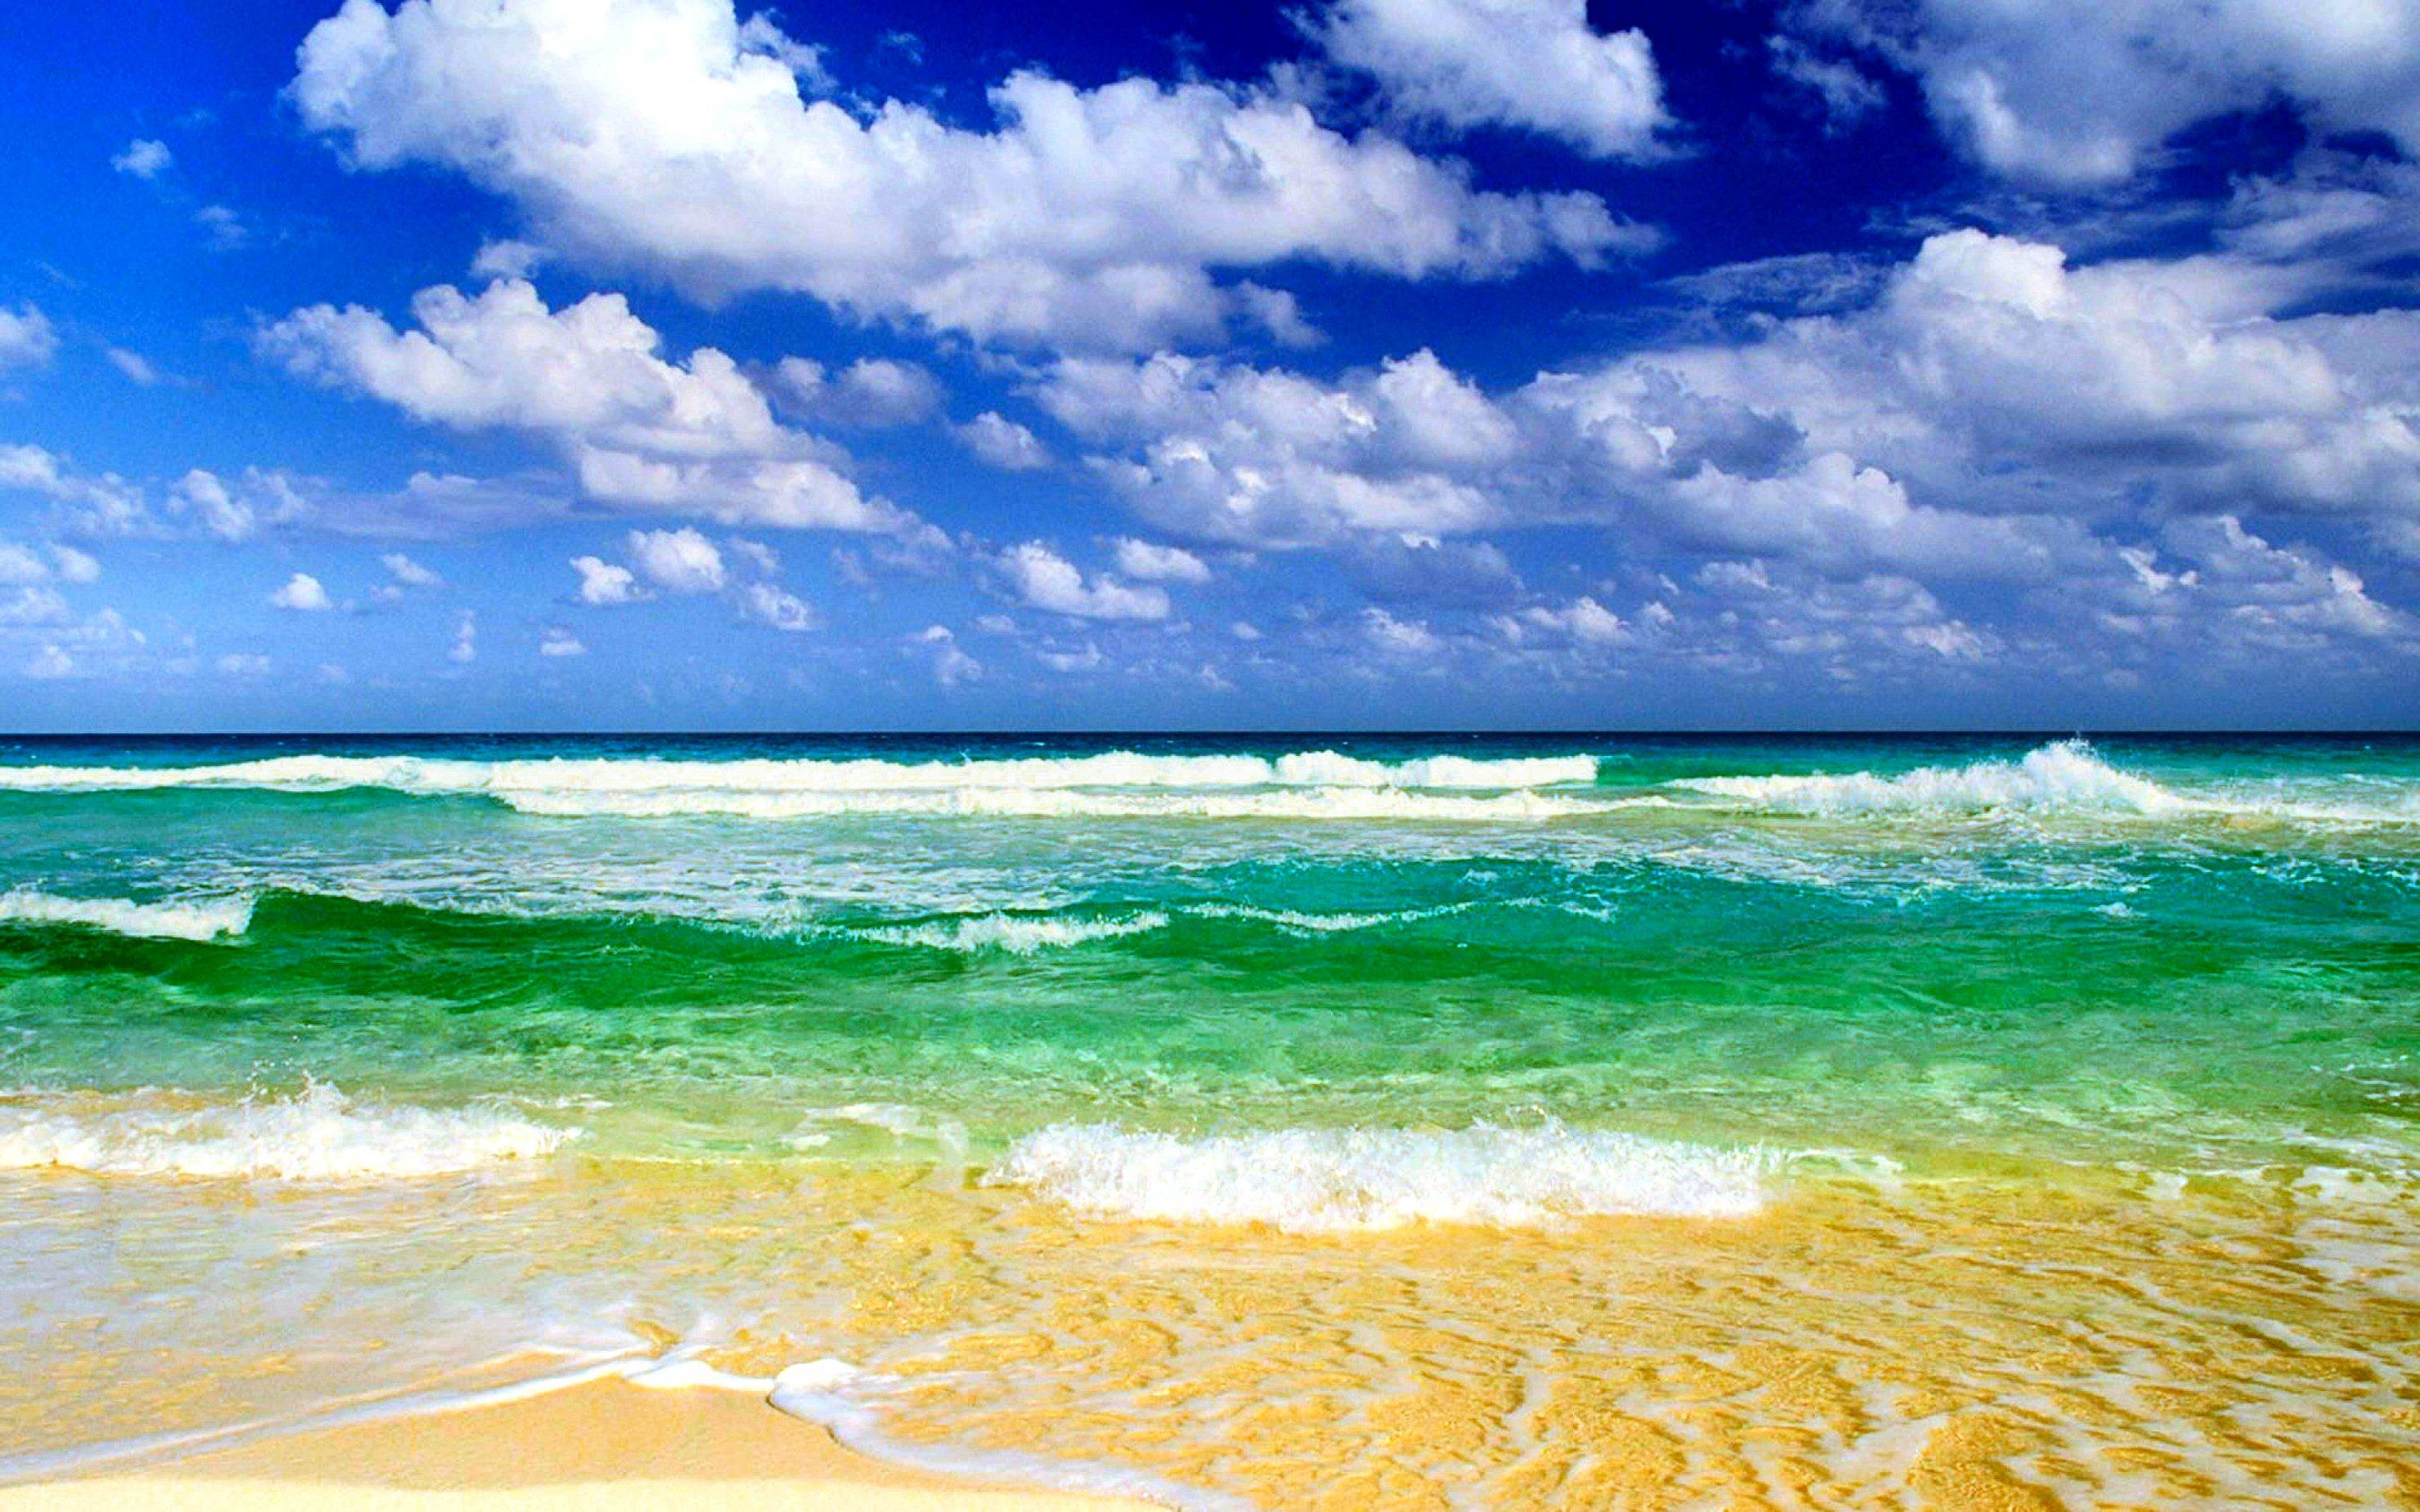 BEACH [10] beach waves [28december2012friday] [2960x1850] [132504] Full HD Wa...